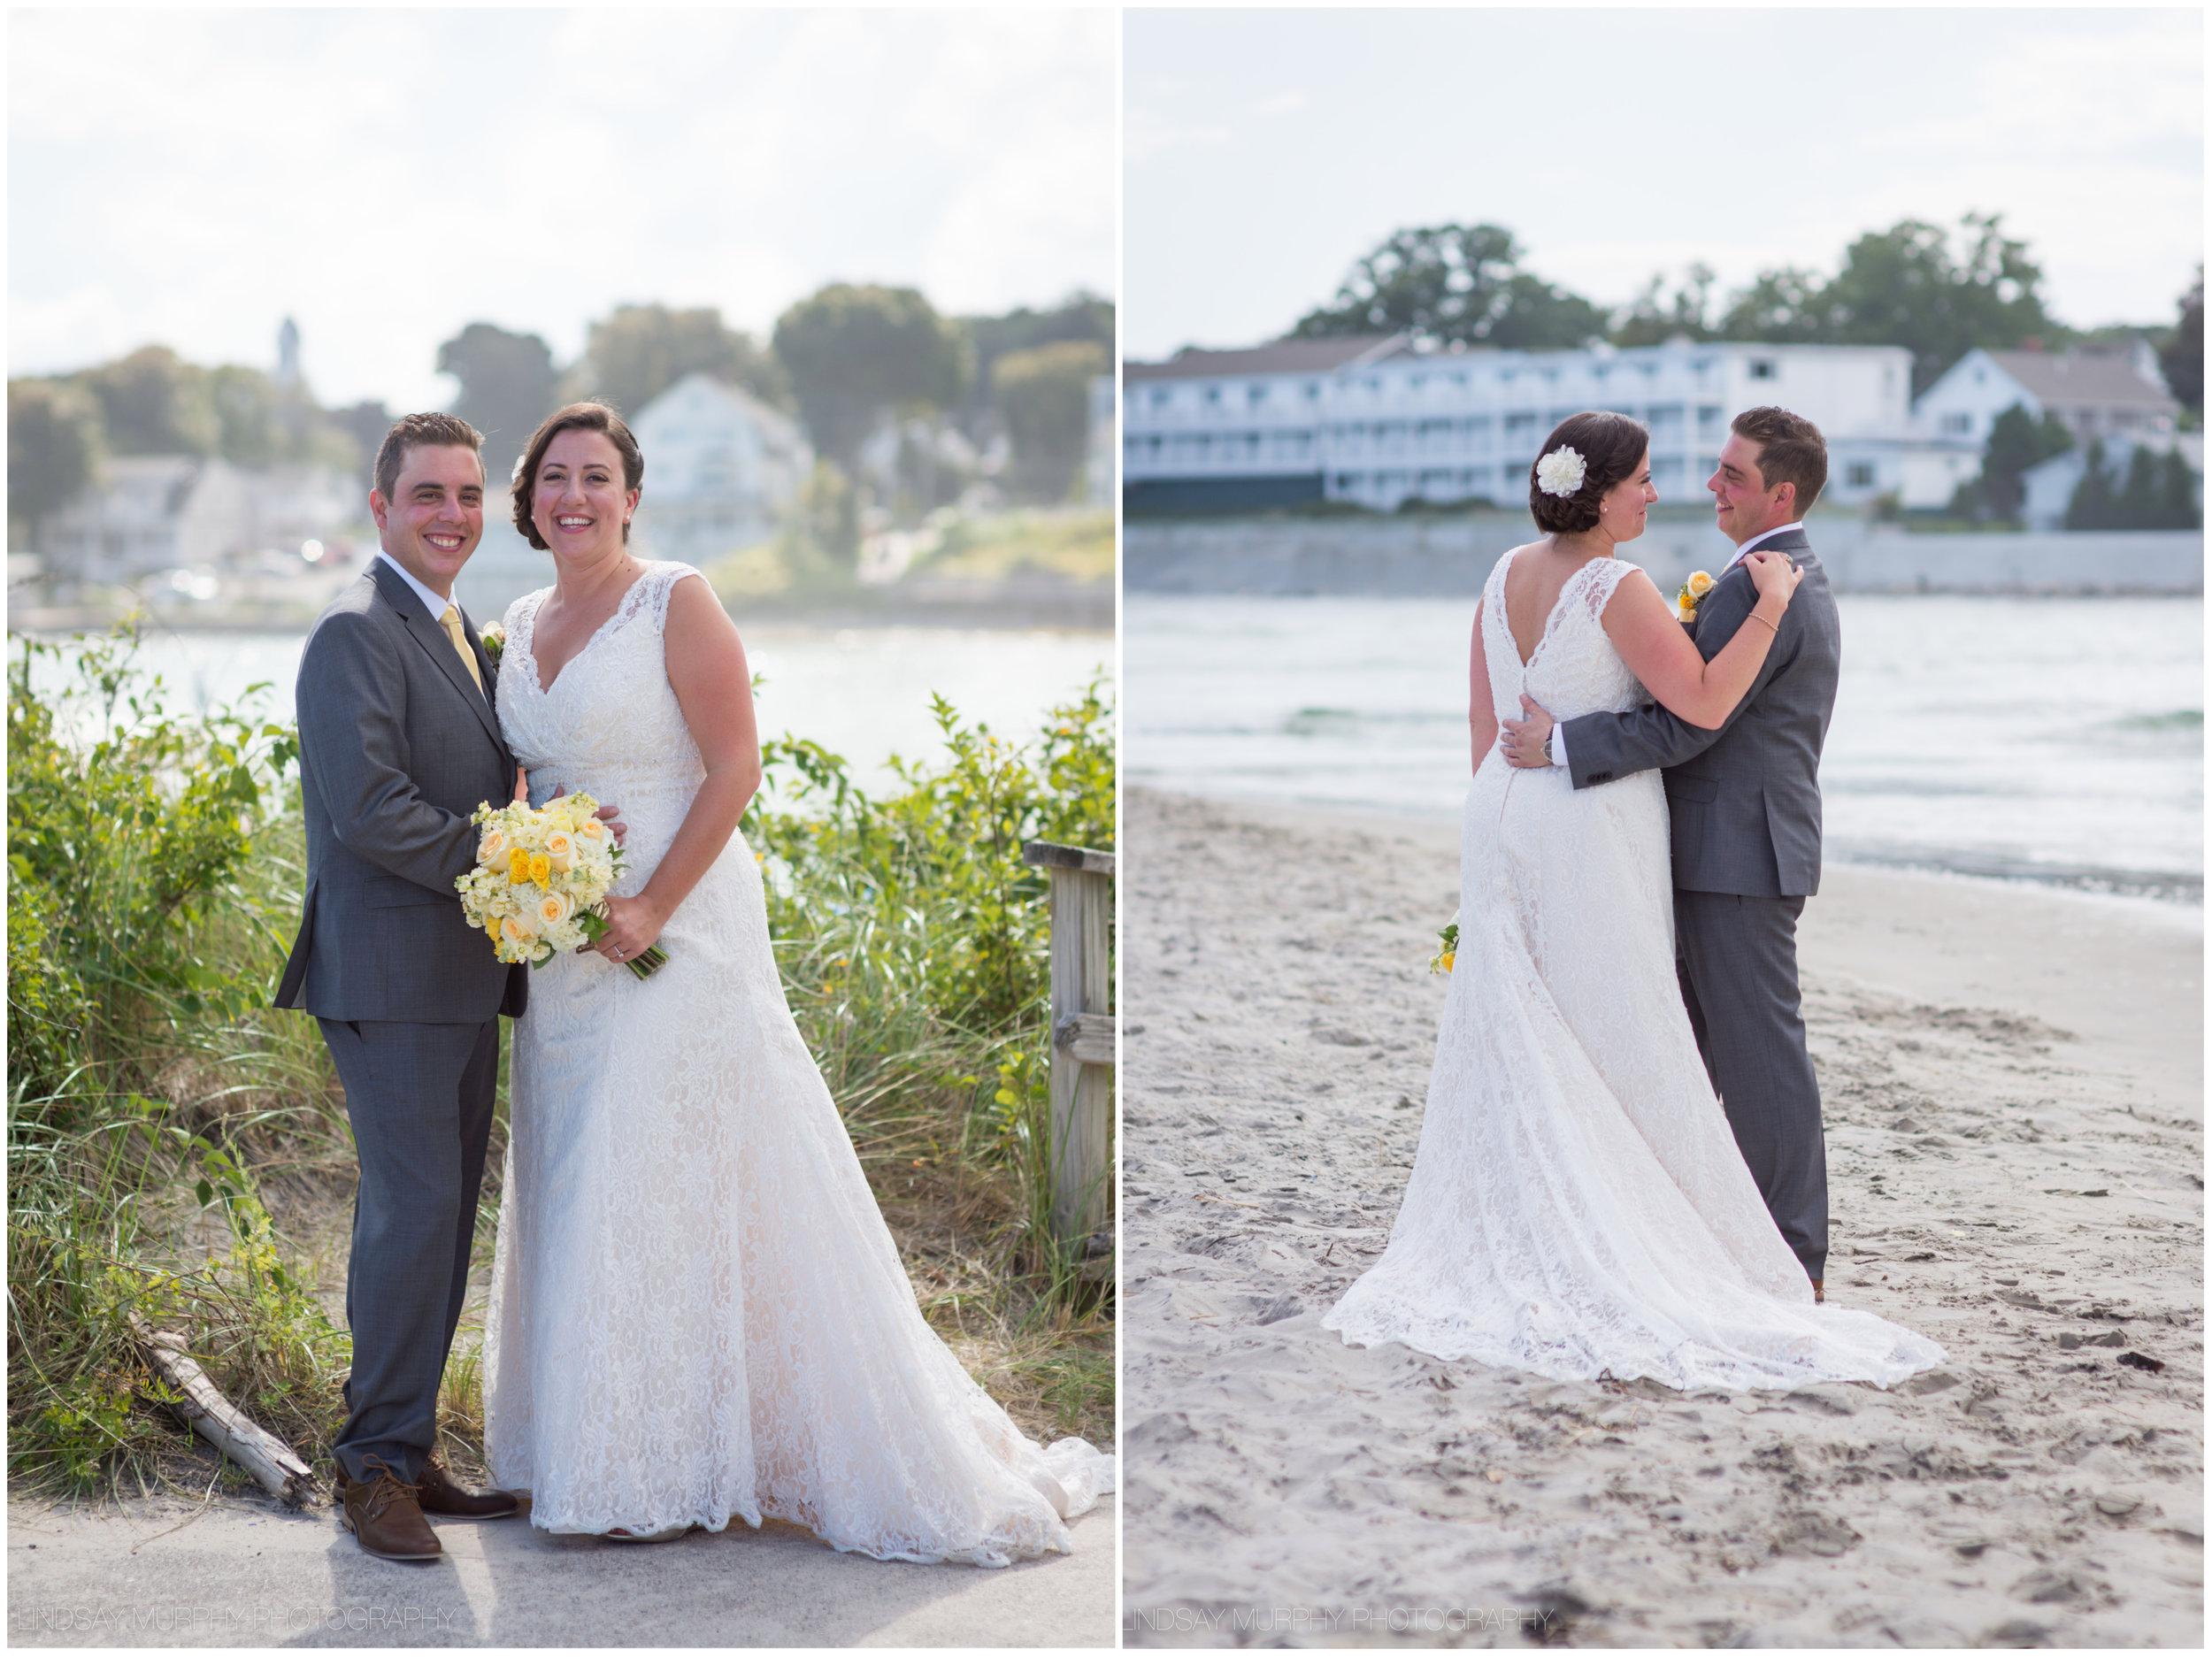 Maine_Wedding28.jpg